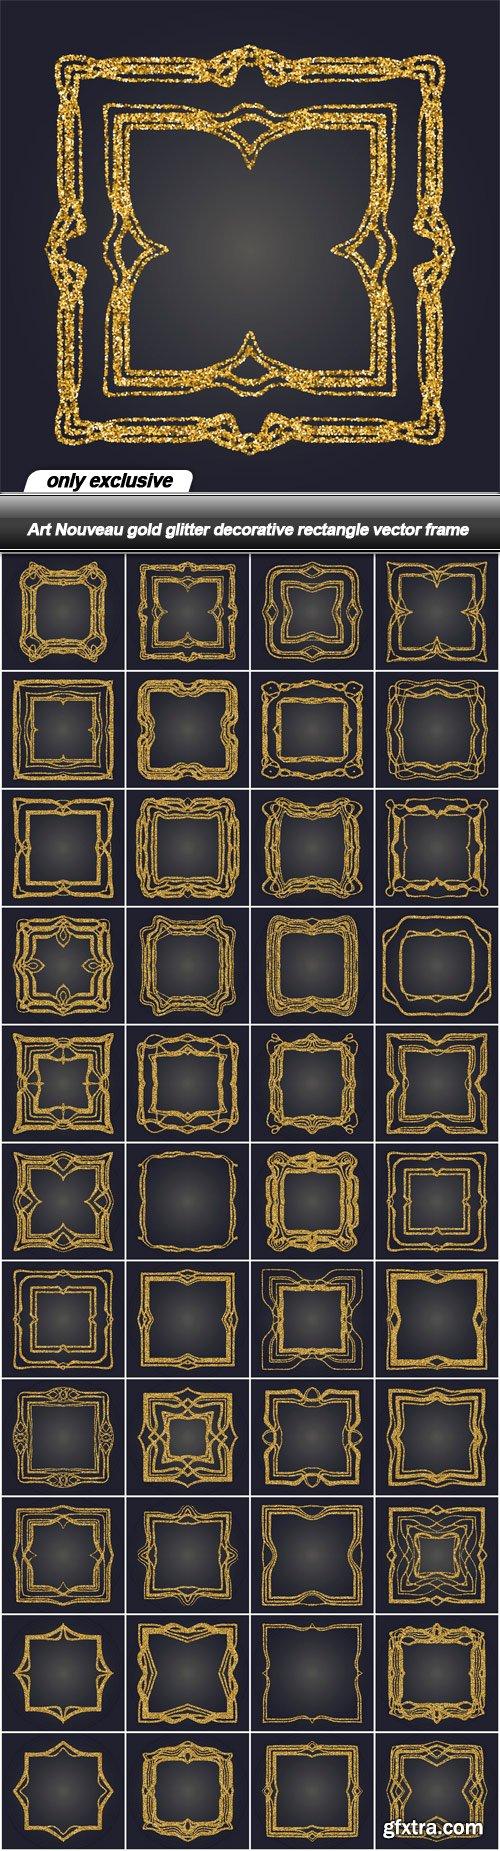 Art Nouveau gold glitter decorative rectangle vector frame - 44 EPS